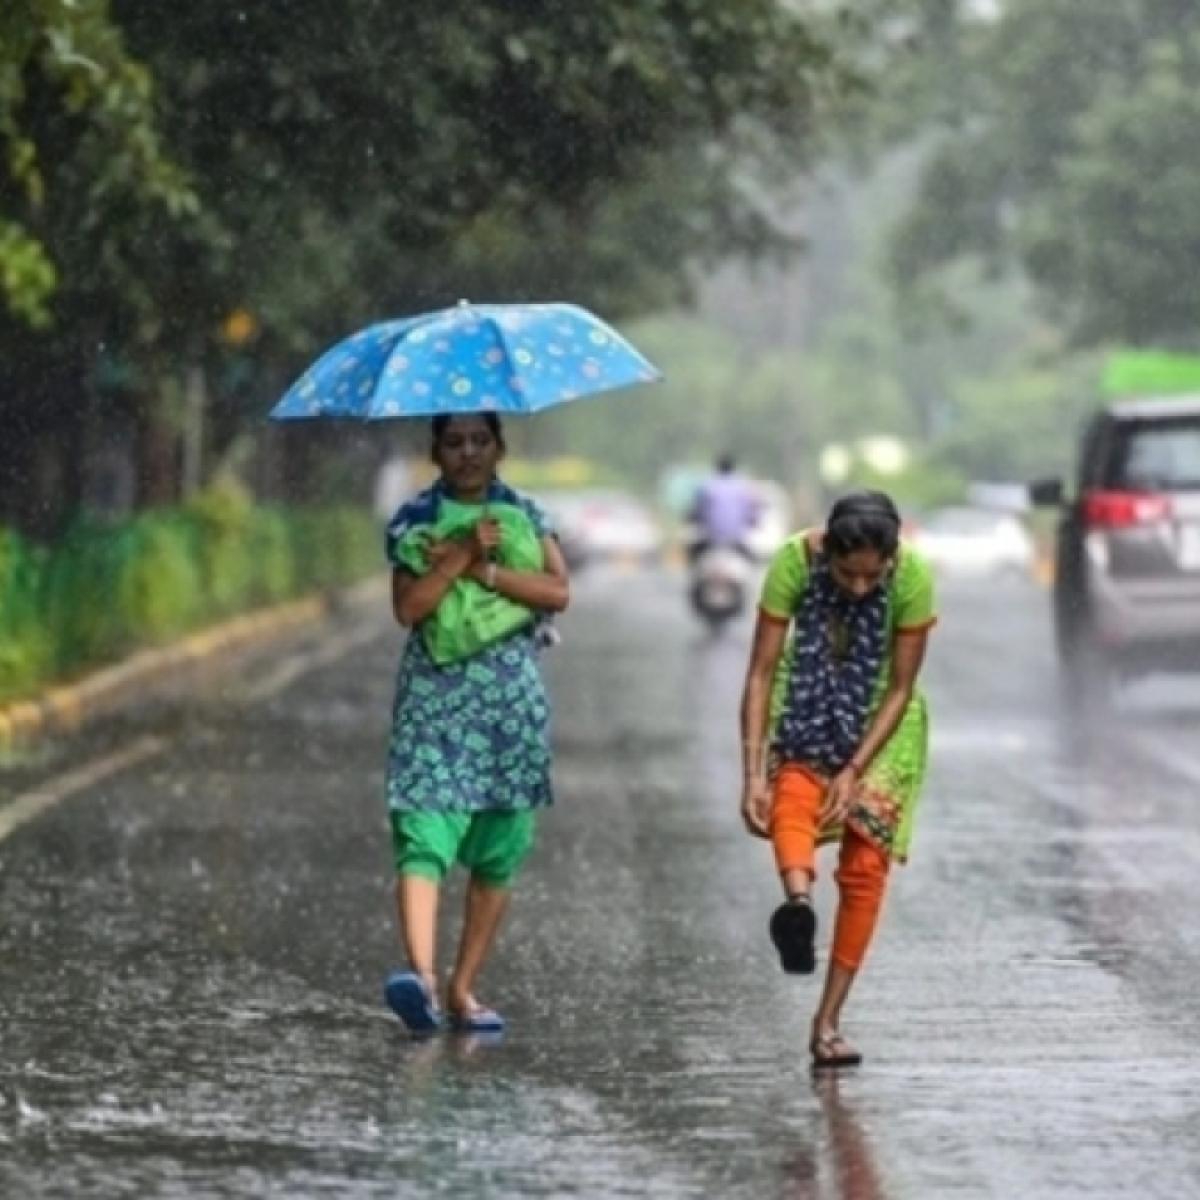 It's raining 'orange', complain Dombivli residents